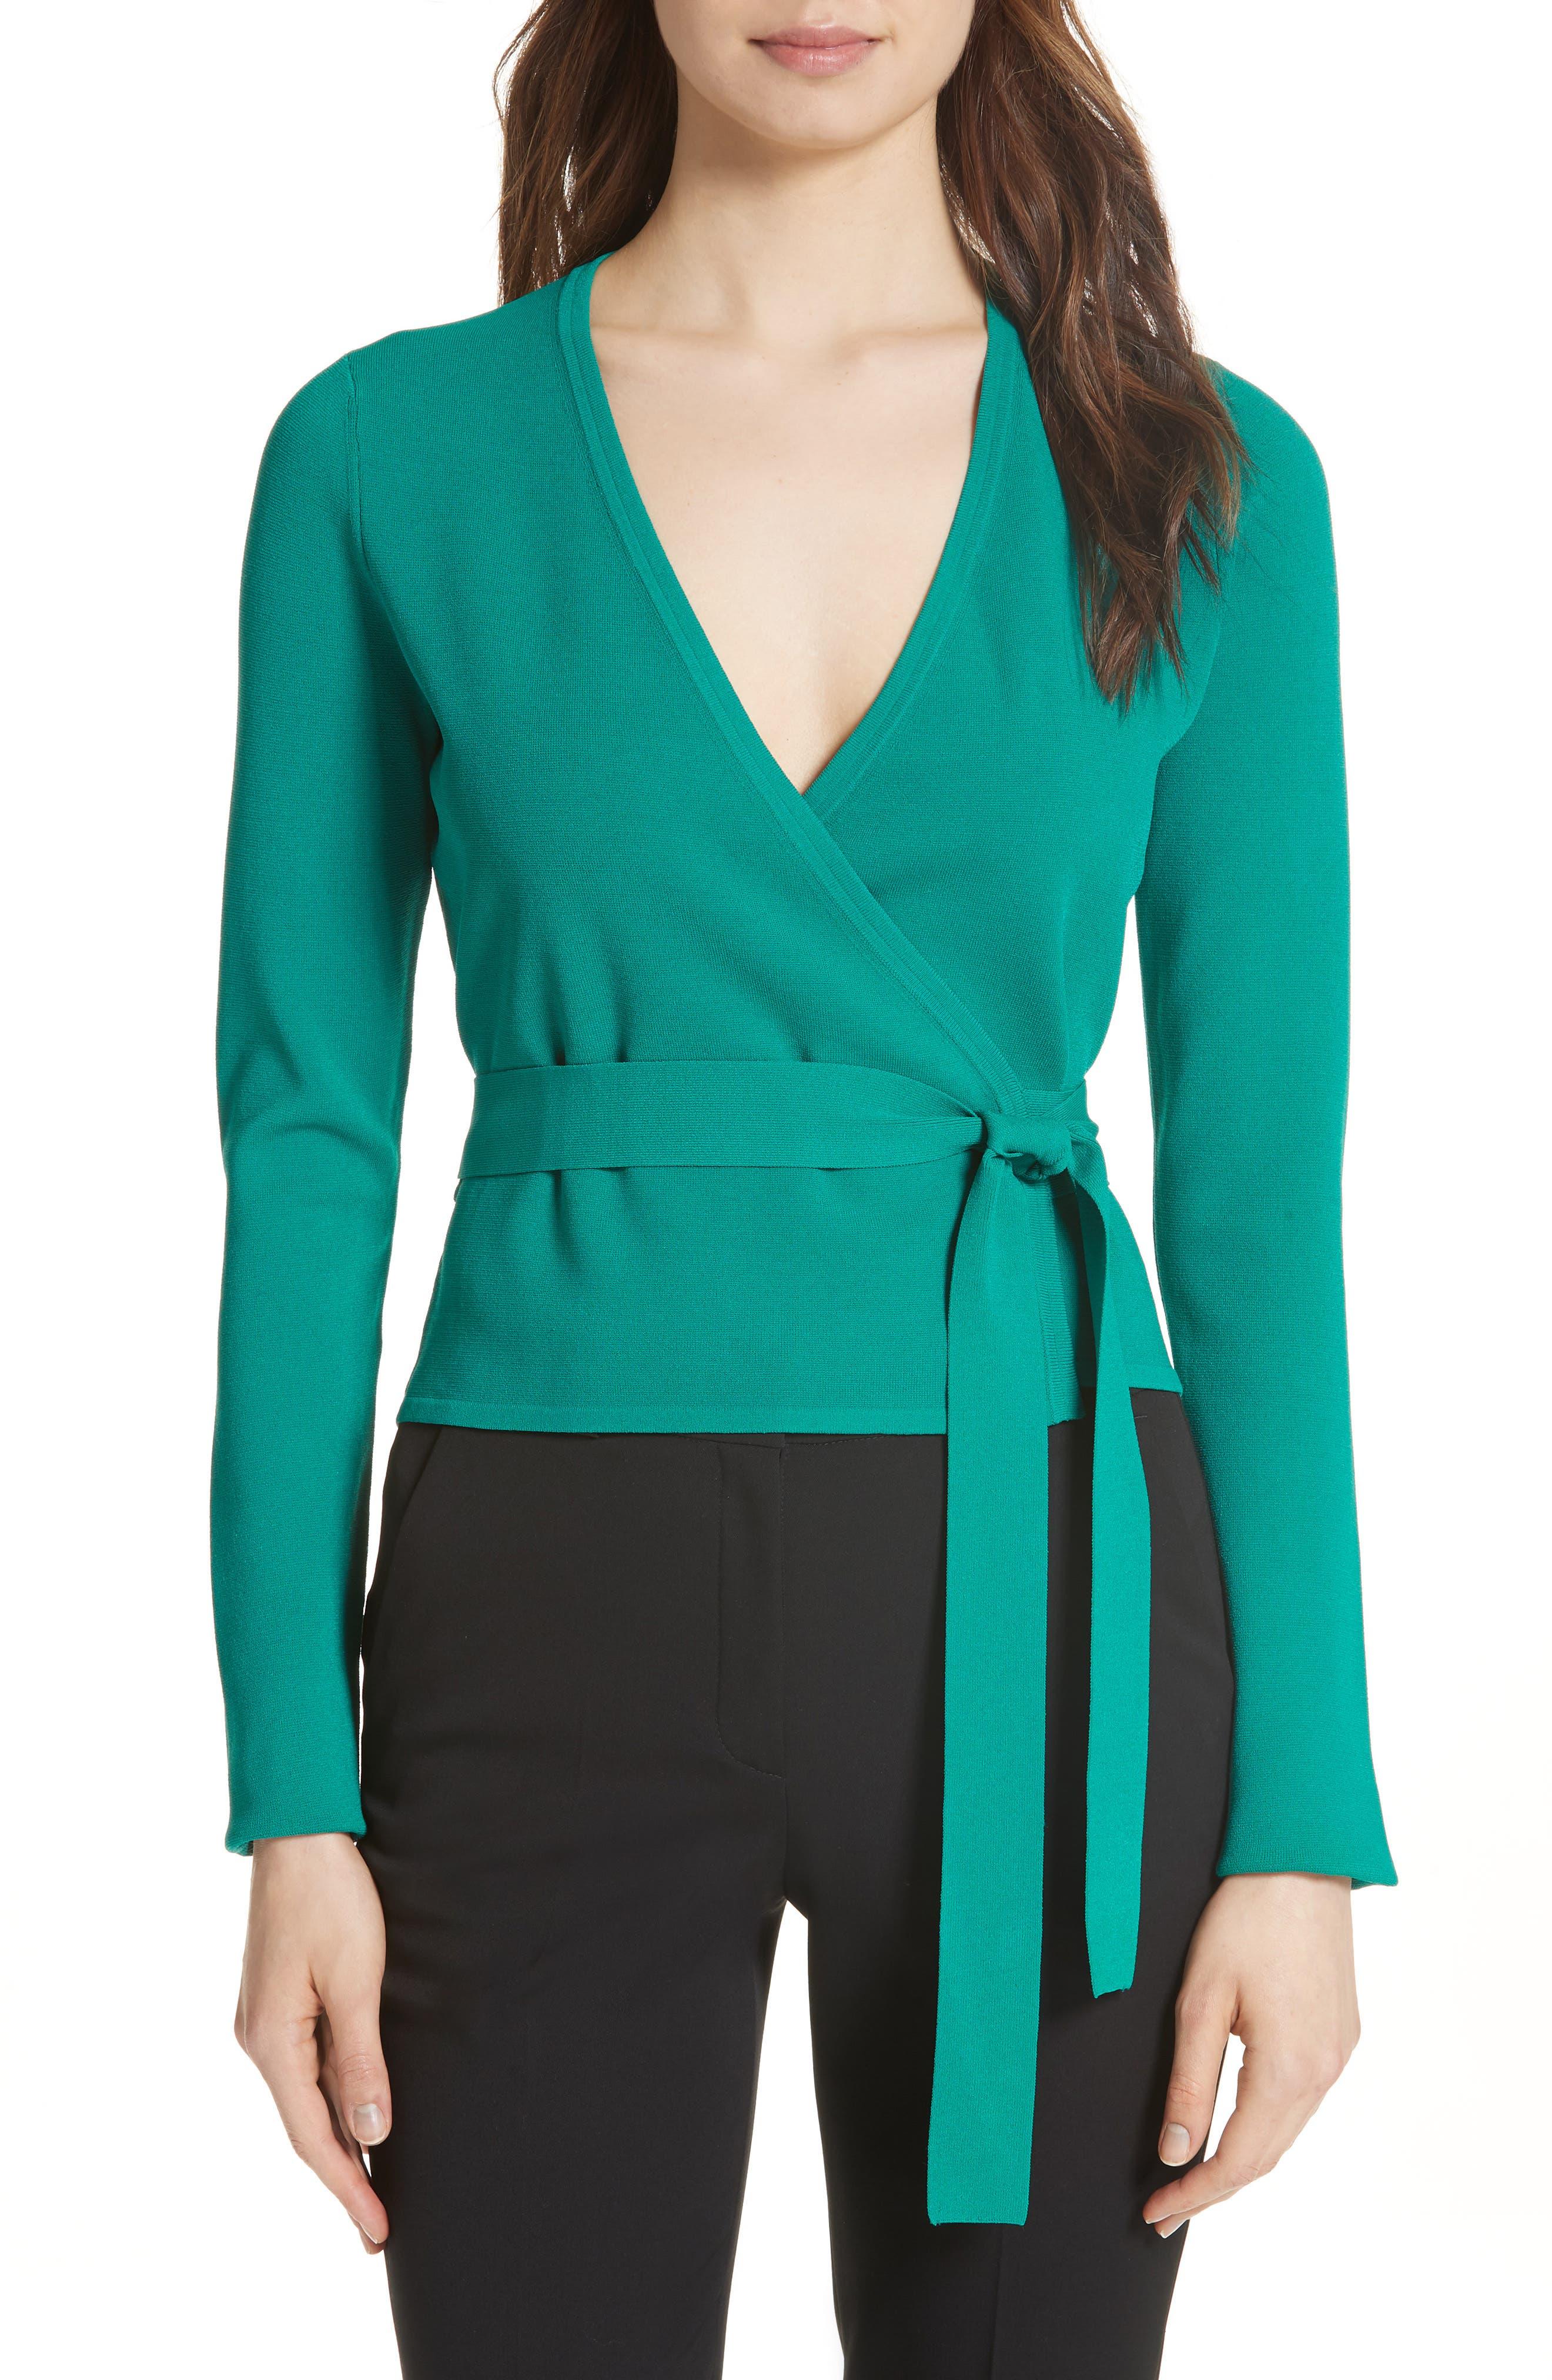 Diane von Furstenberg Knit Wrap Top,                         Main,                         color, 340